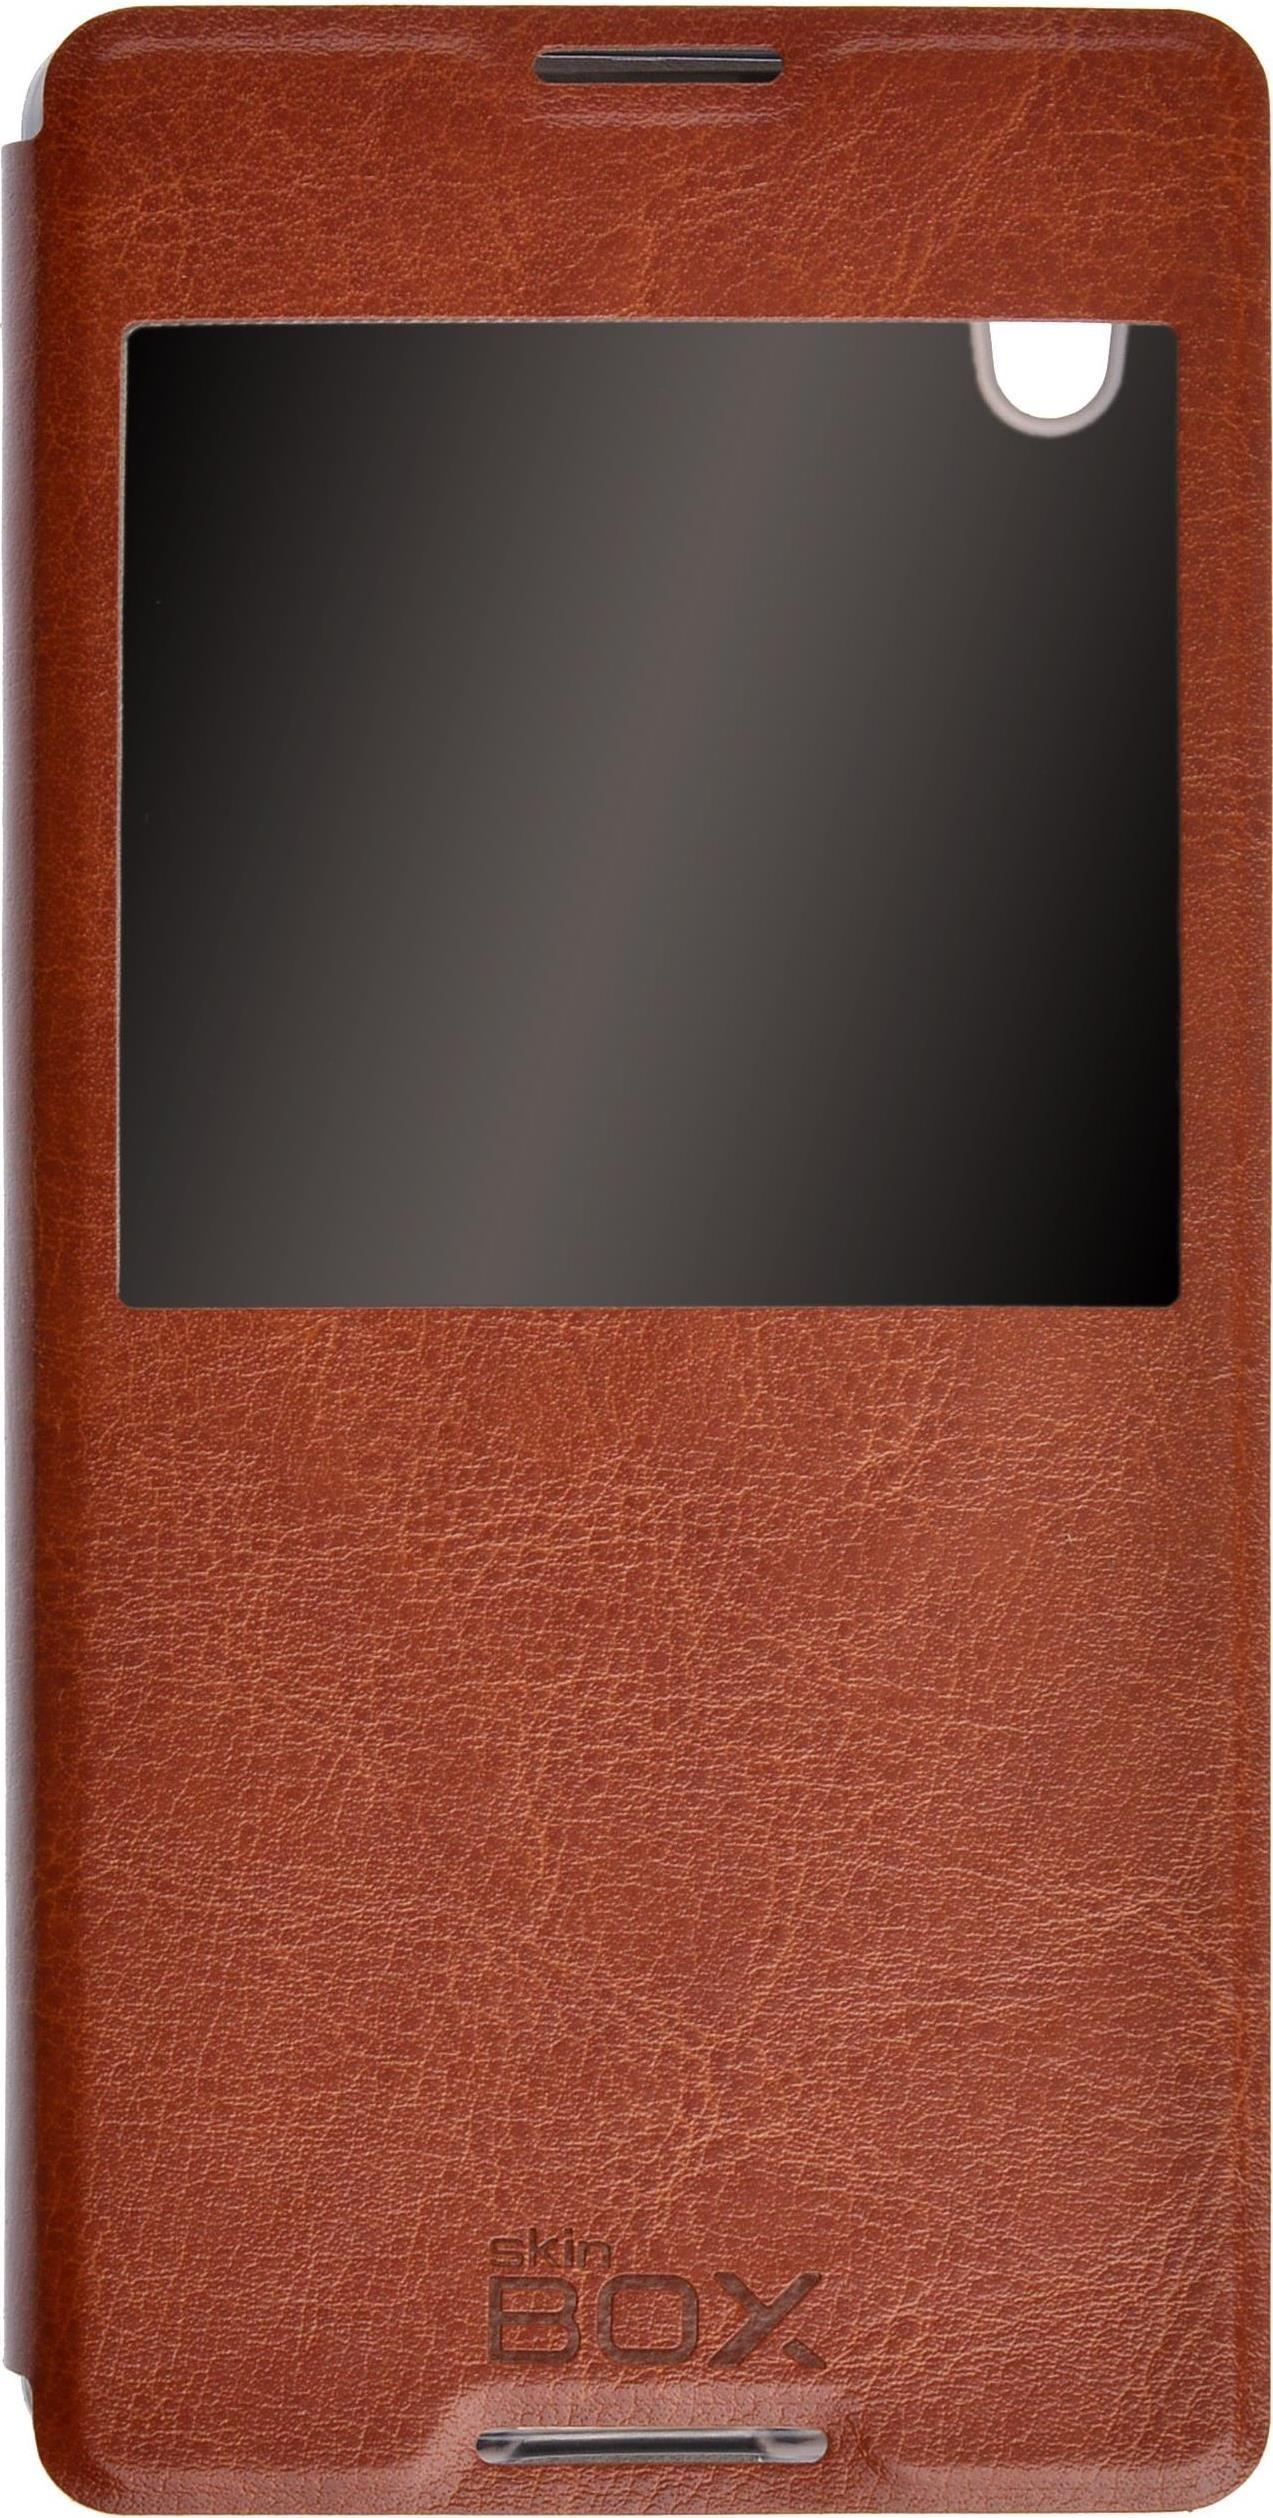 цена на Чехол для сотового телефона skinBOX Lux AW, 4630042525511, коричневый